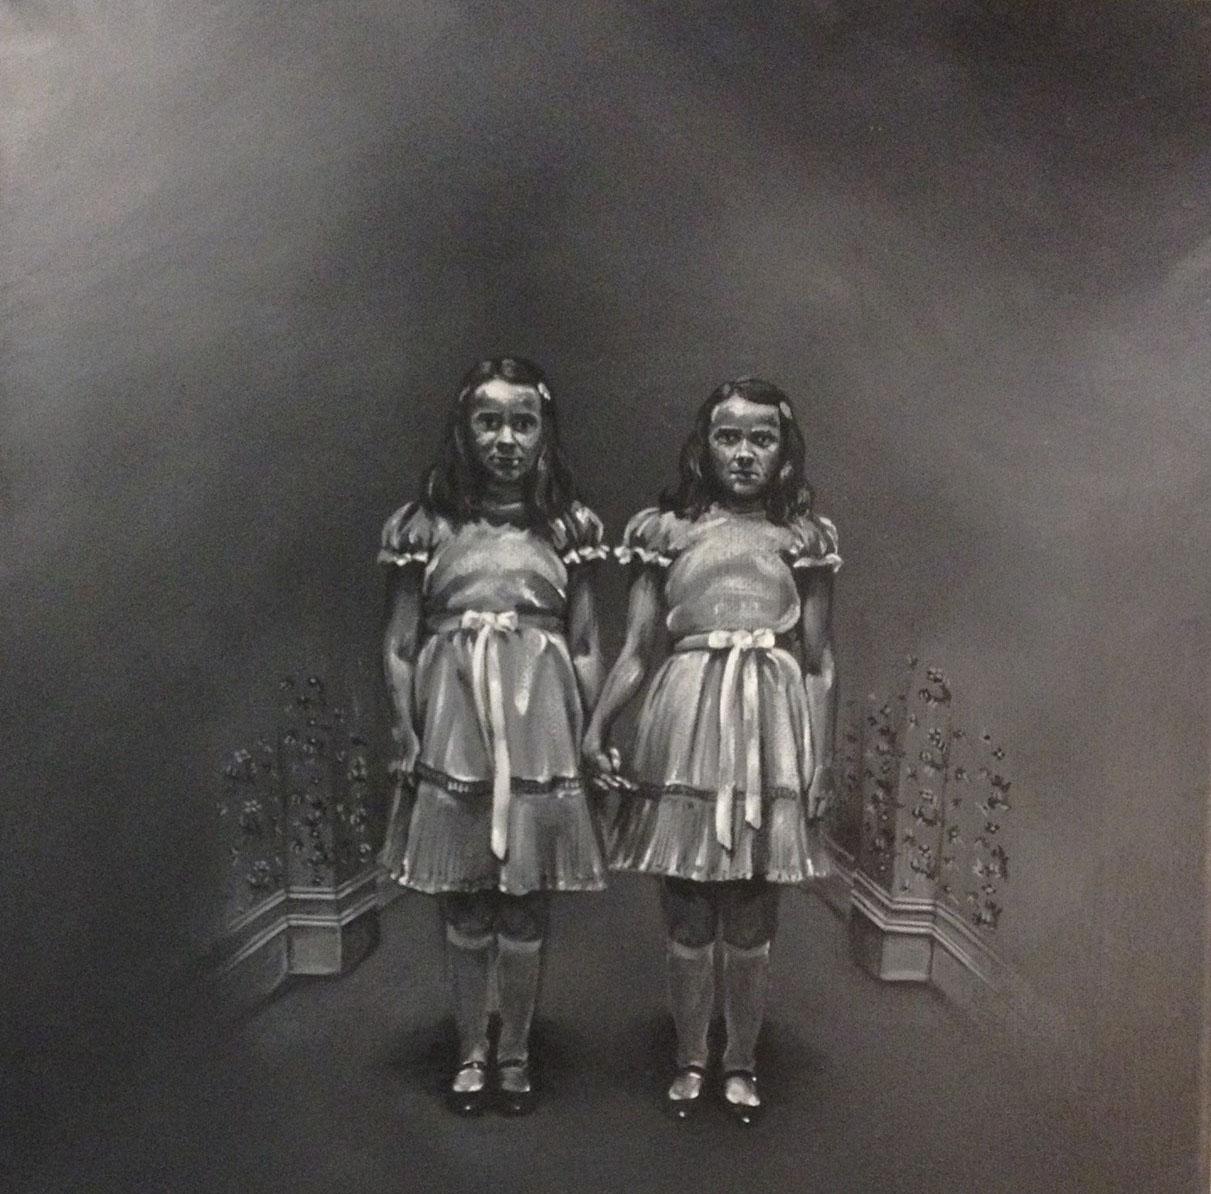 Twins (2015)